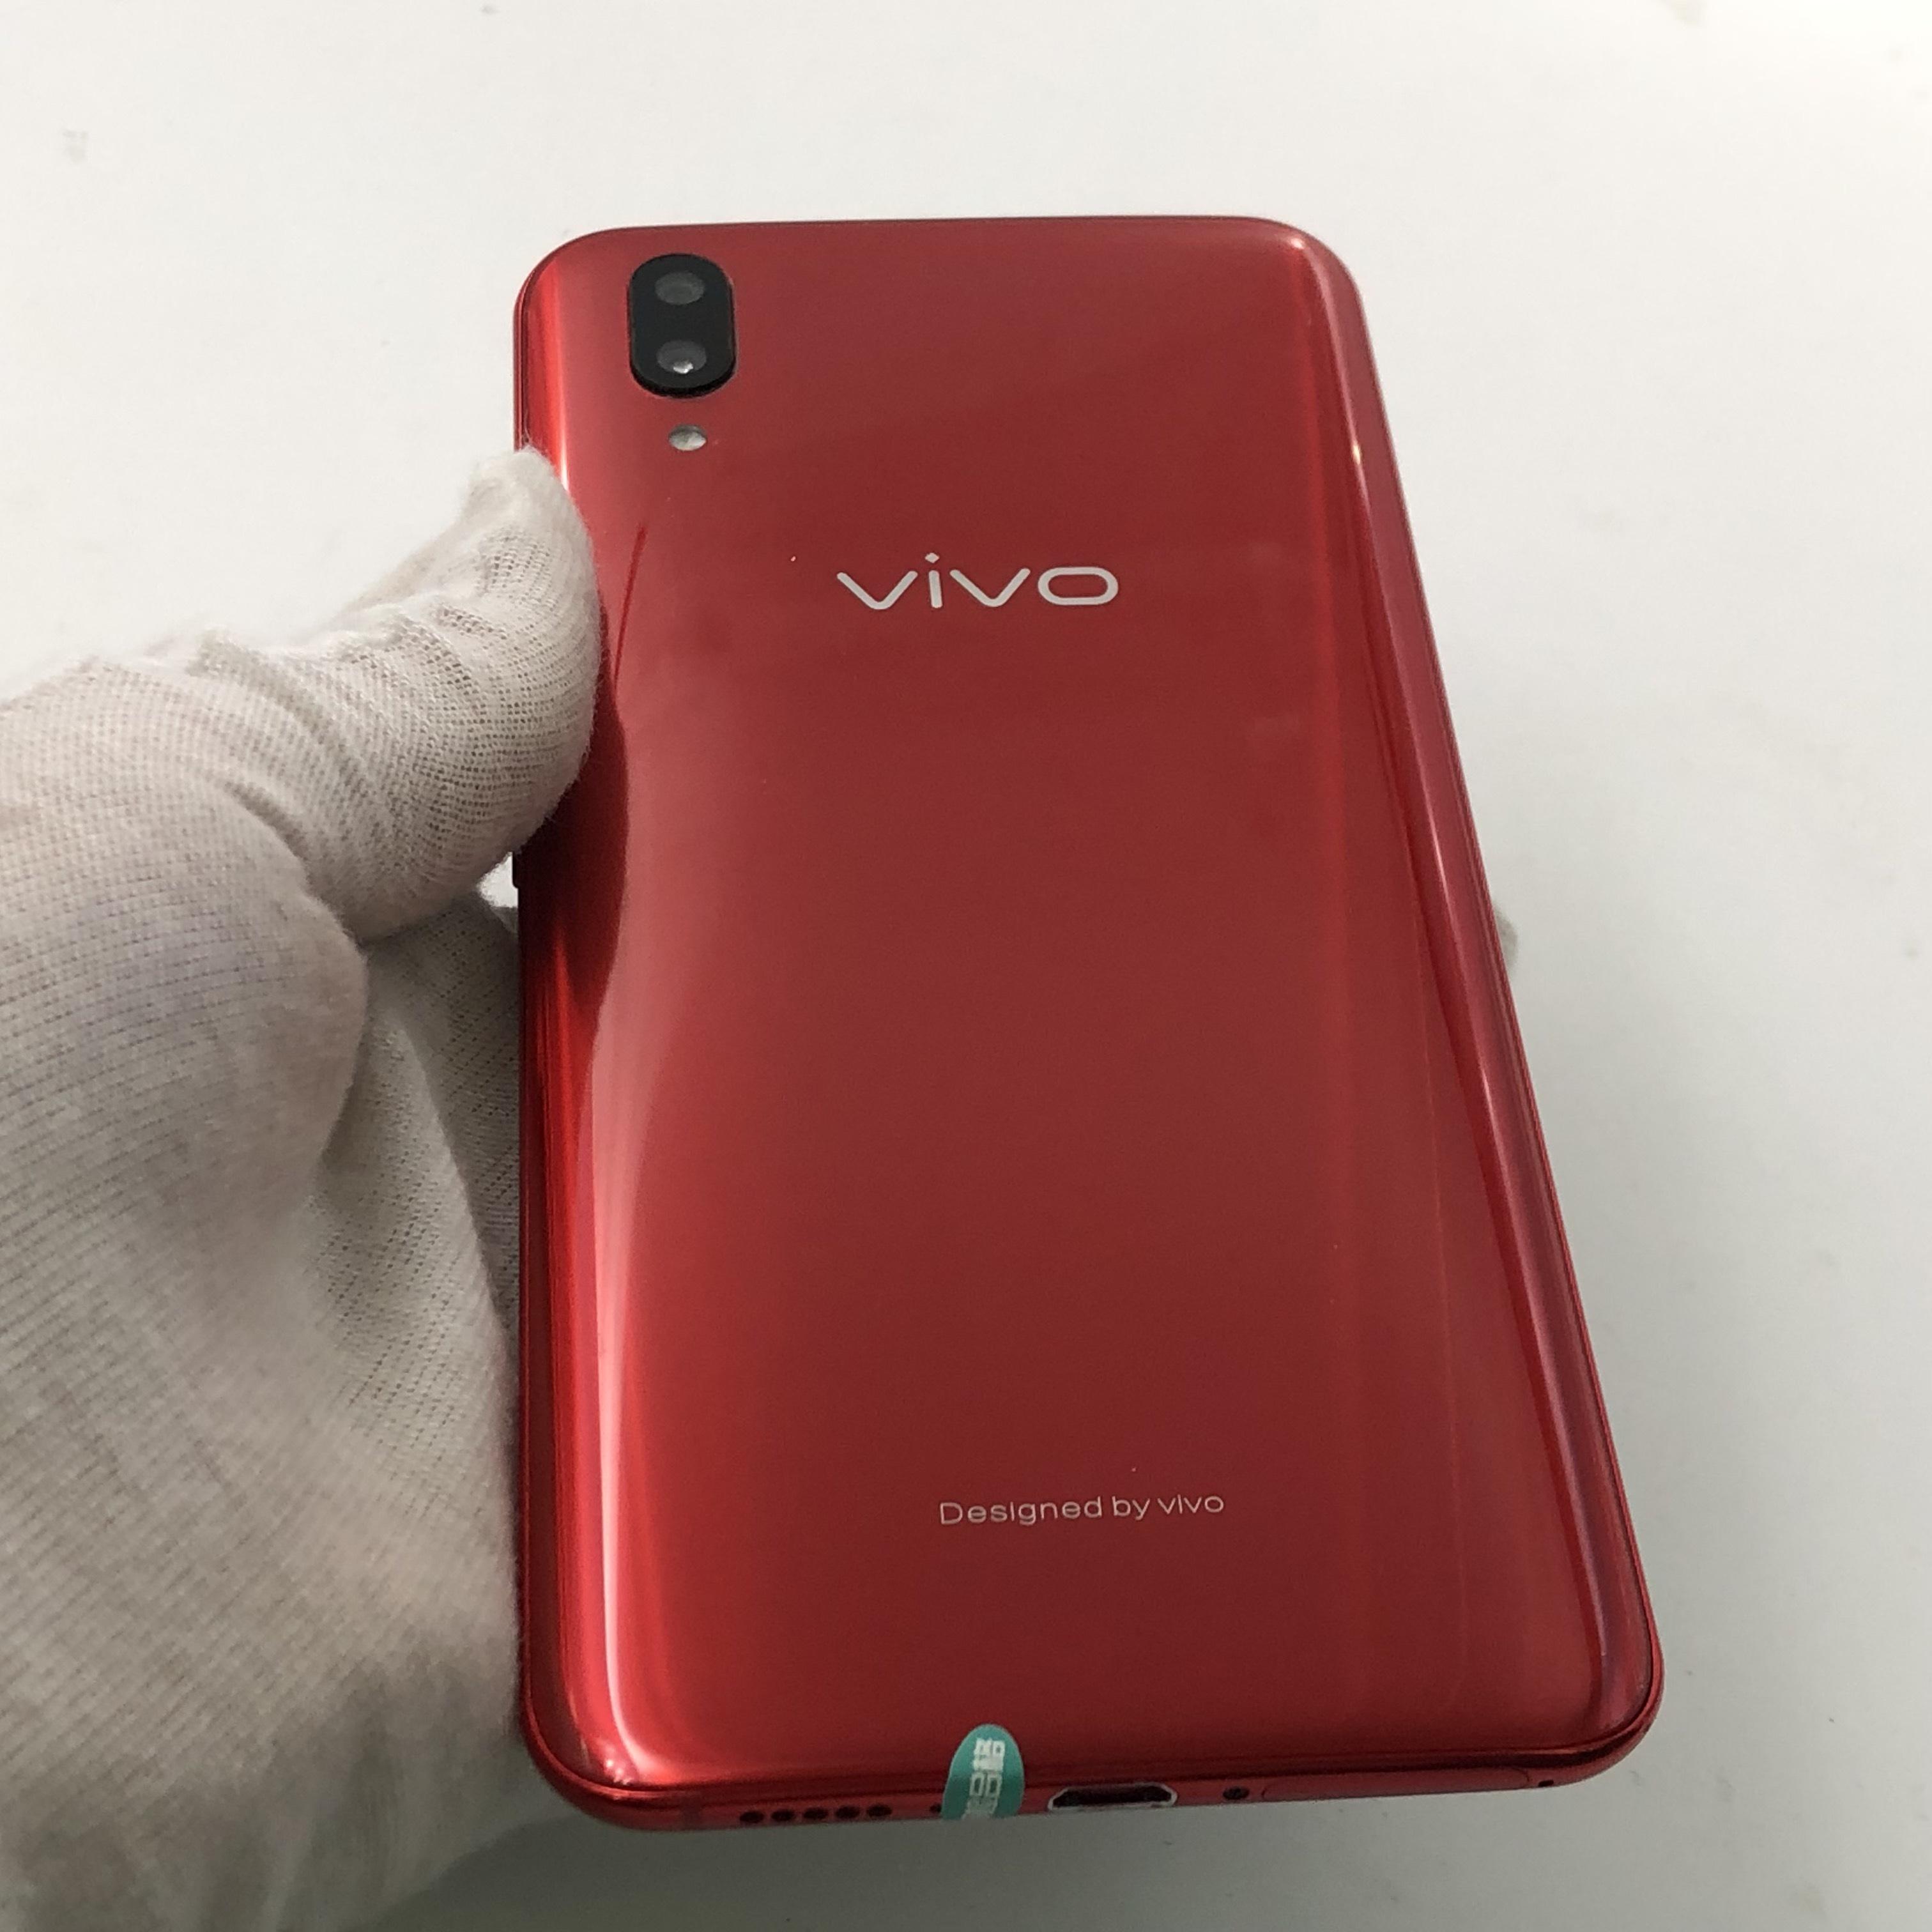 vivo【vivo X21 屏幕指纹版】4G全网通 红色 128G 国行 9成新